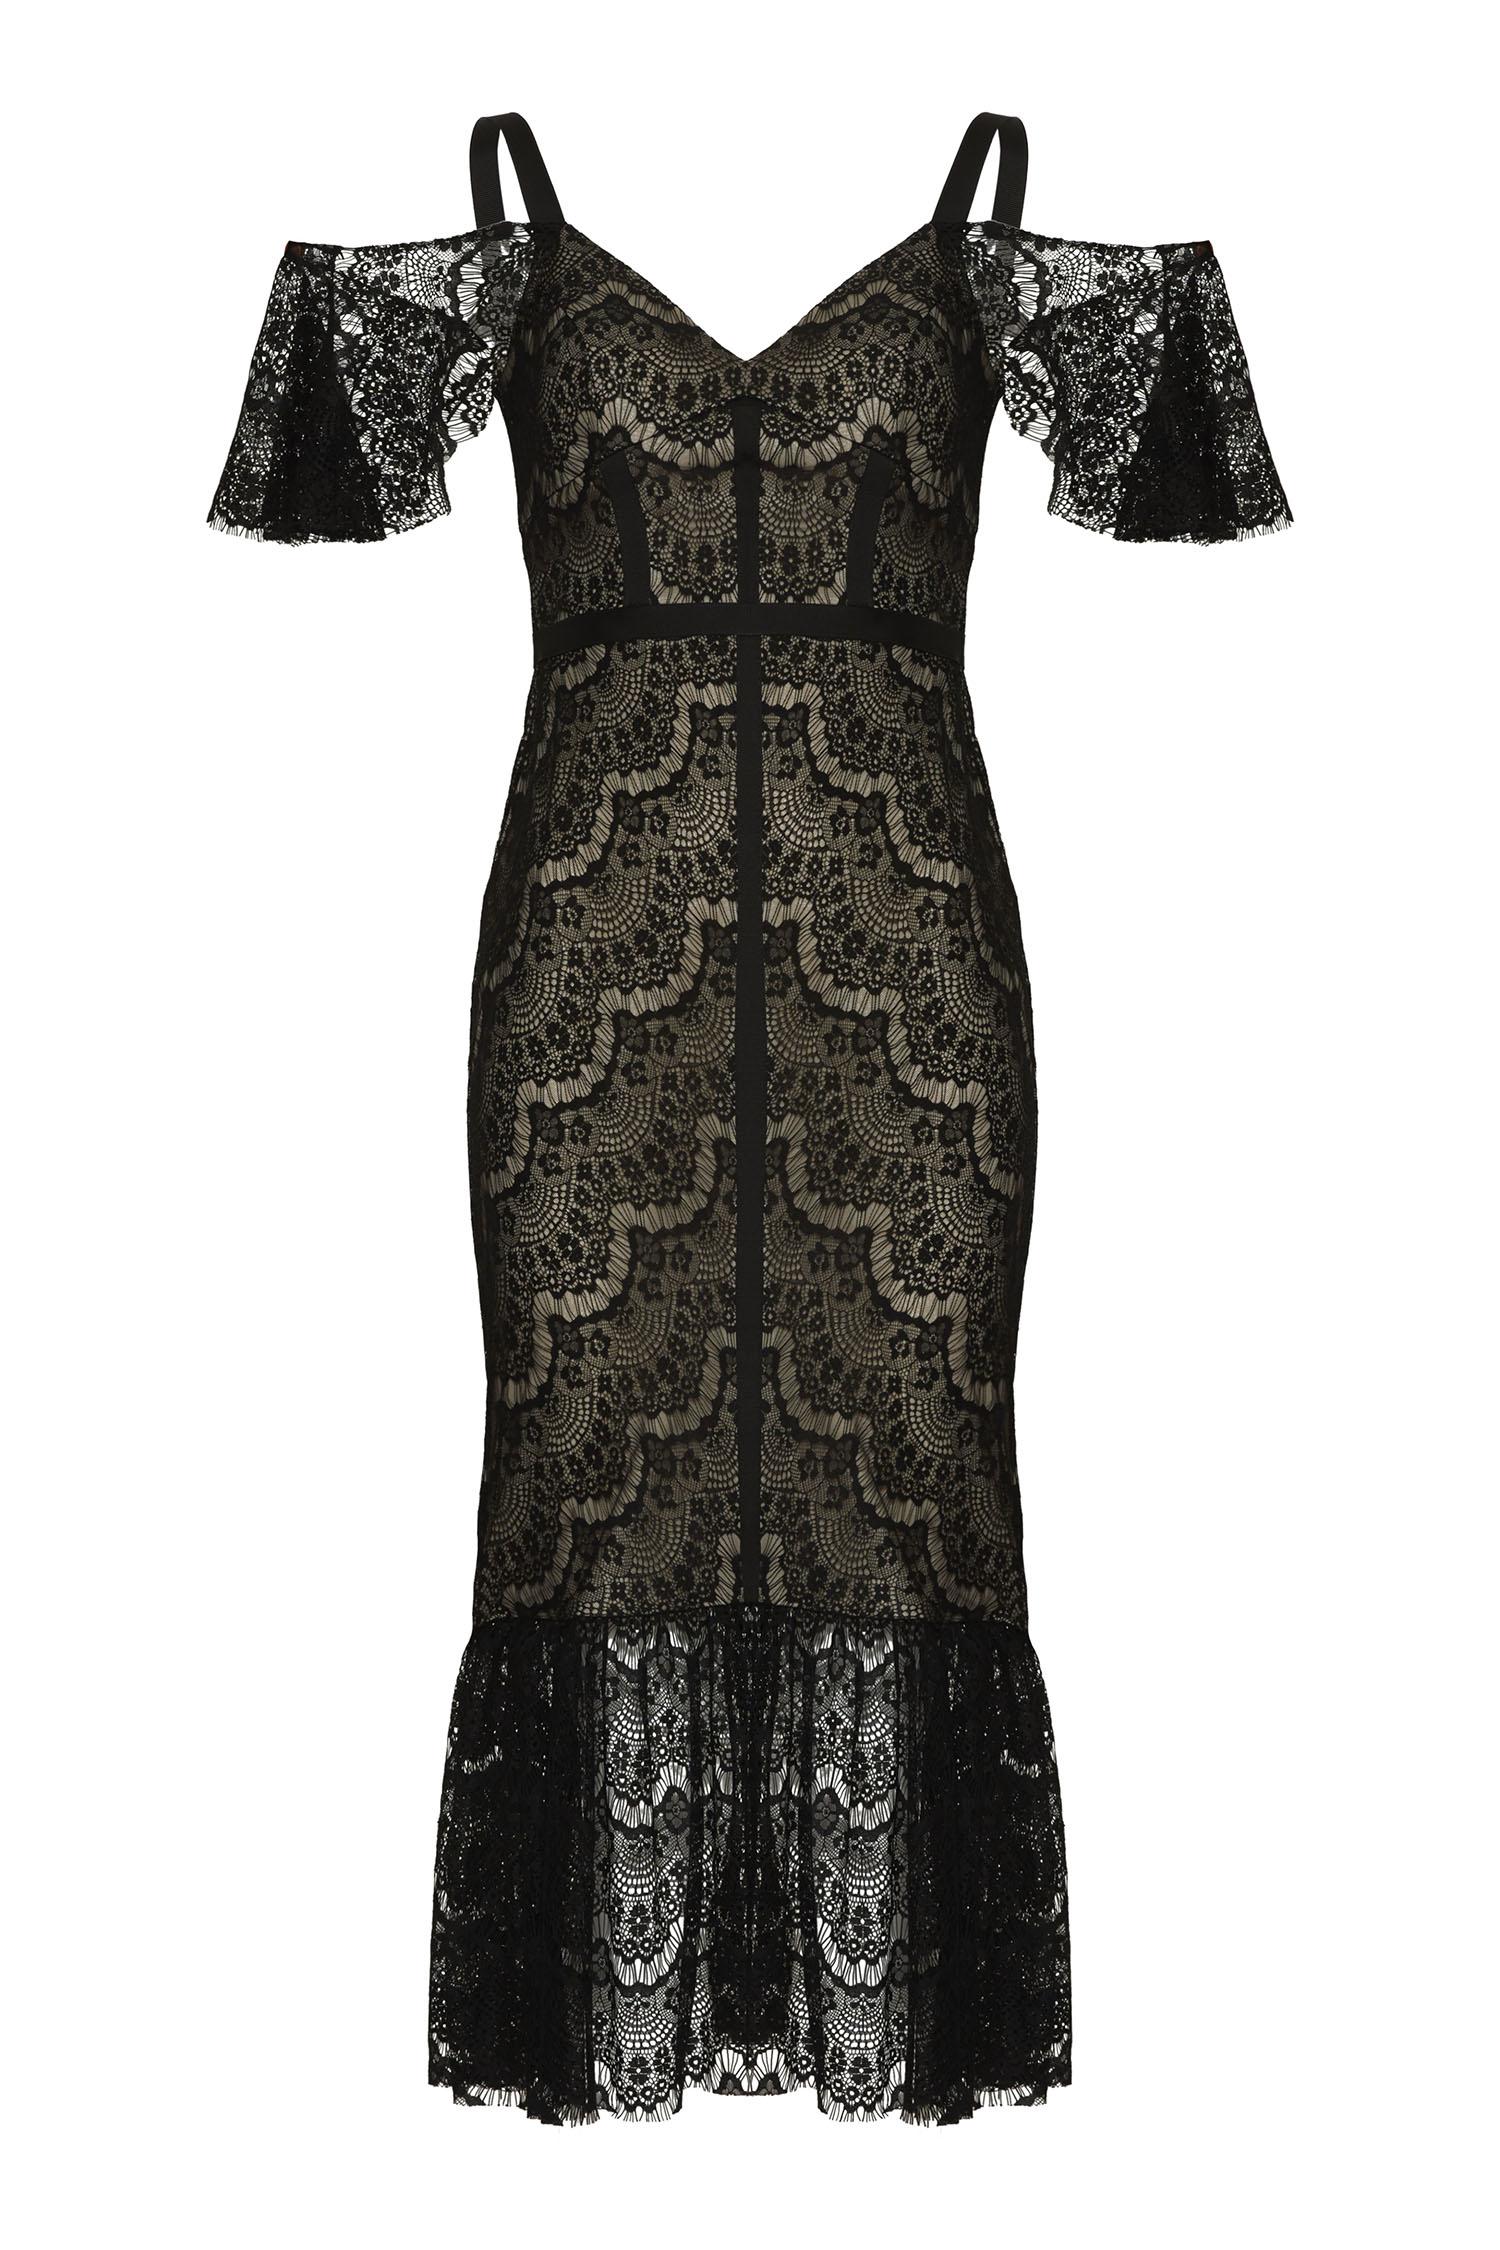 Dantel İşlemeli Siyah Renk Midi Elbise